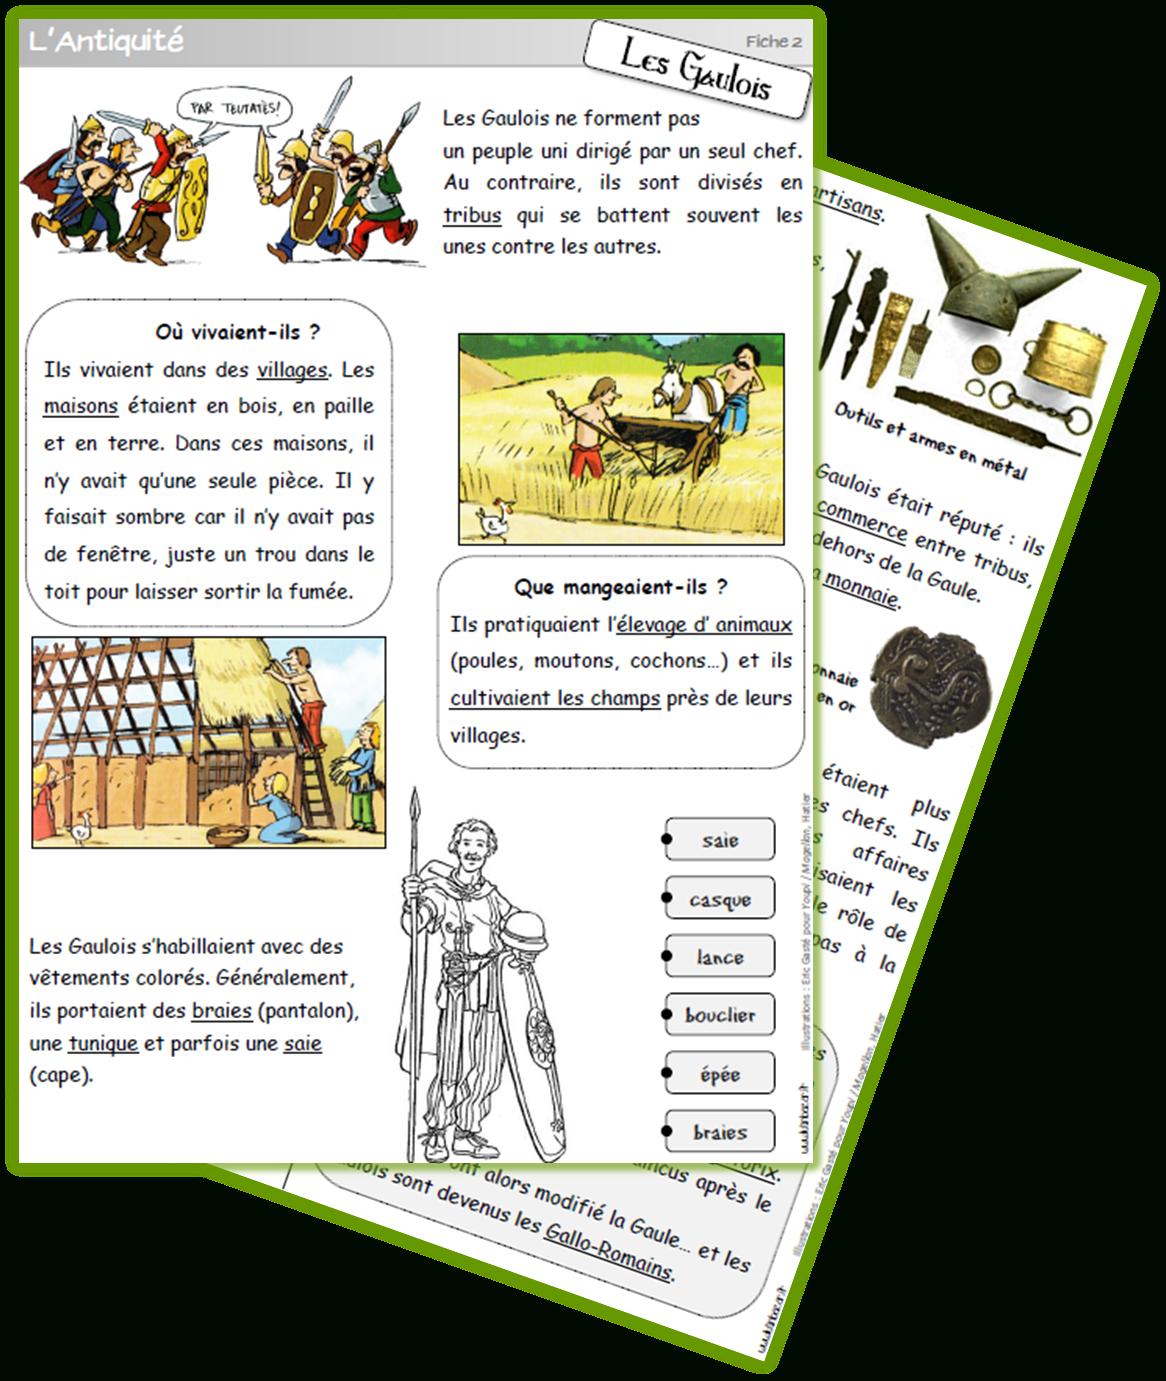 Antiquité Gaulois Cycle 2 | Lutin Bazar serapportantà Lutin Bazar Poésie